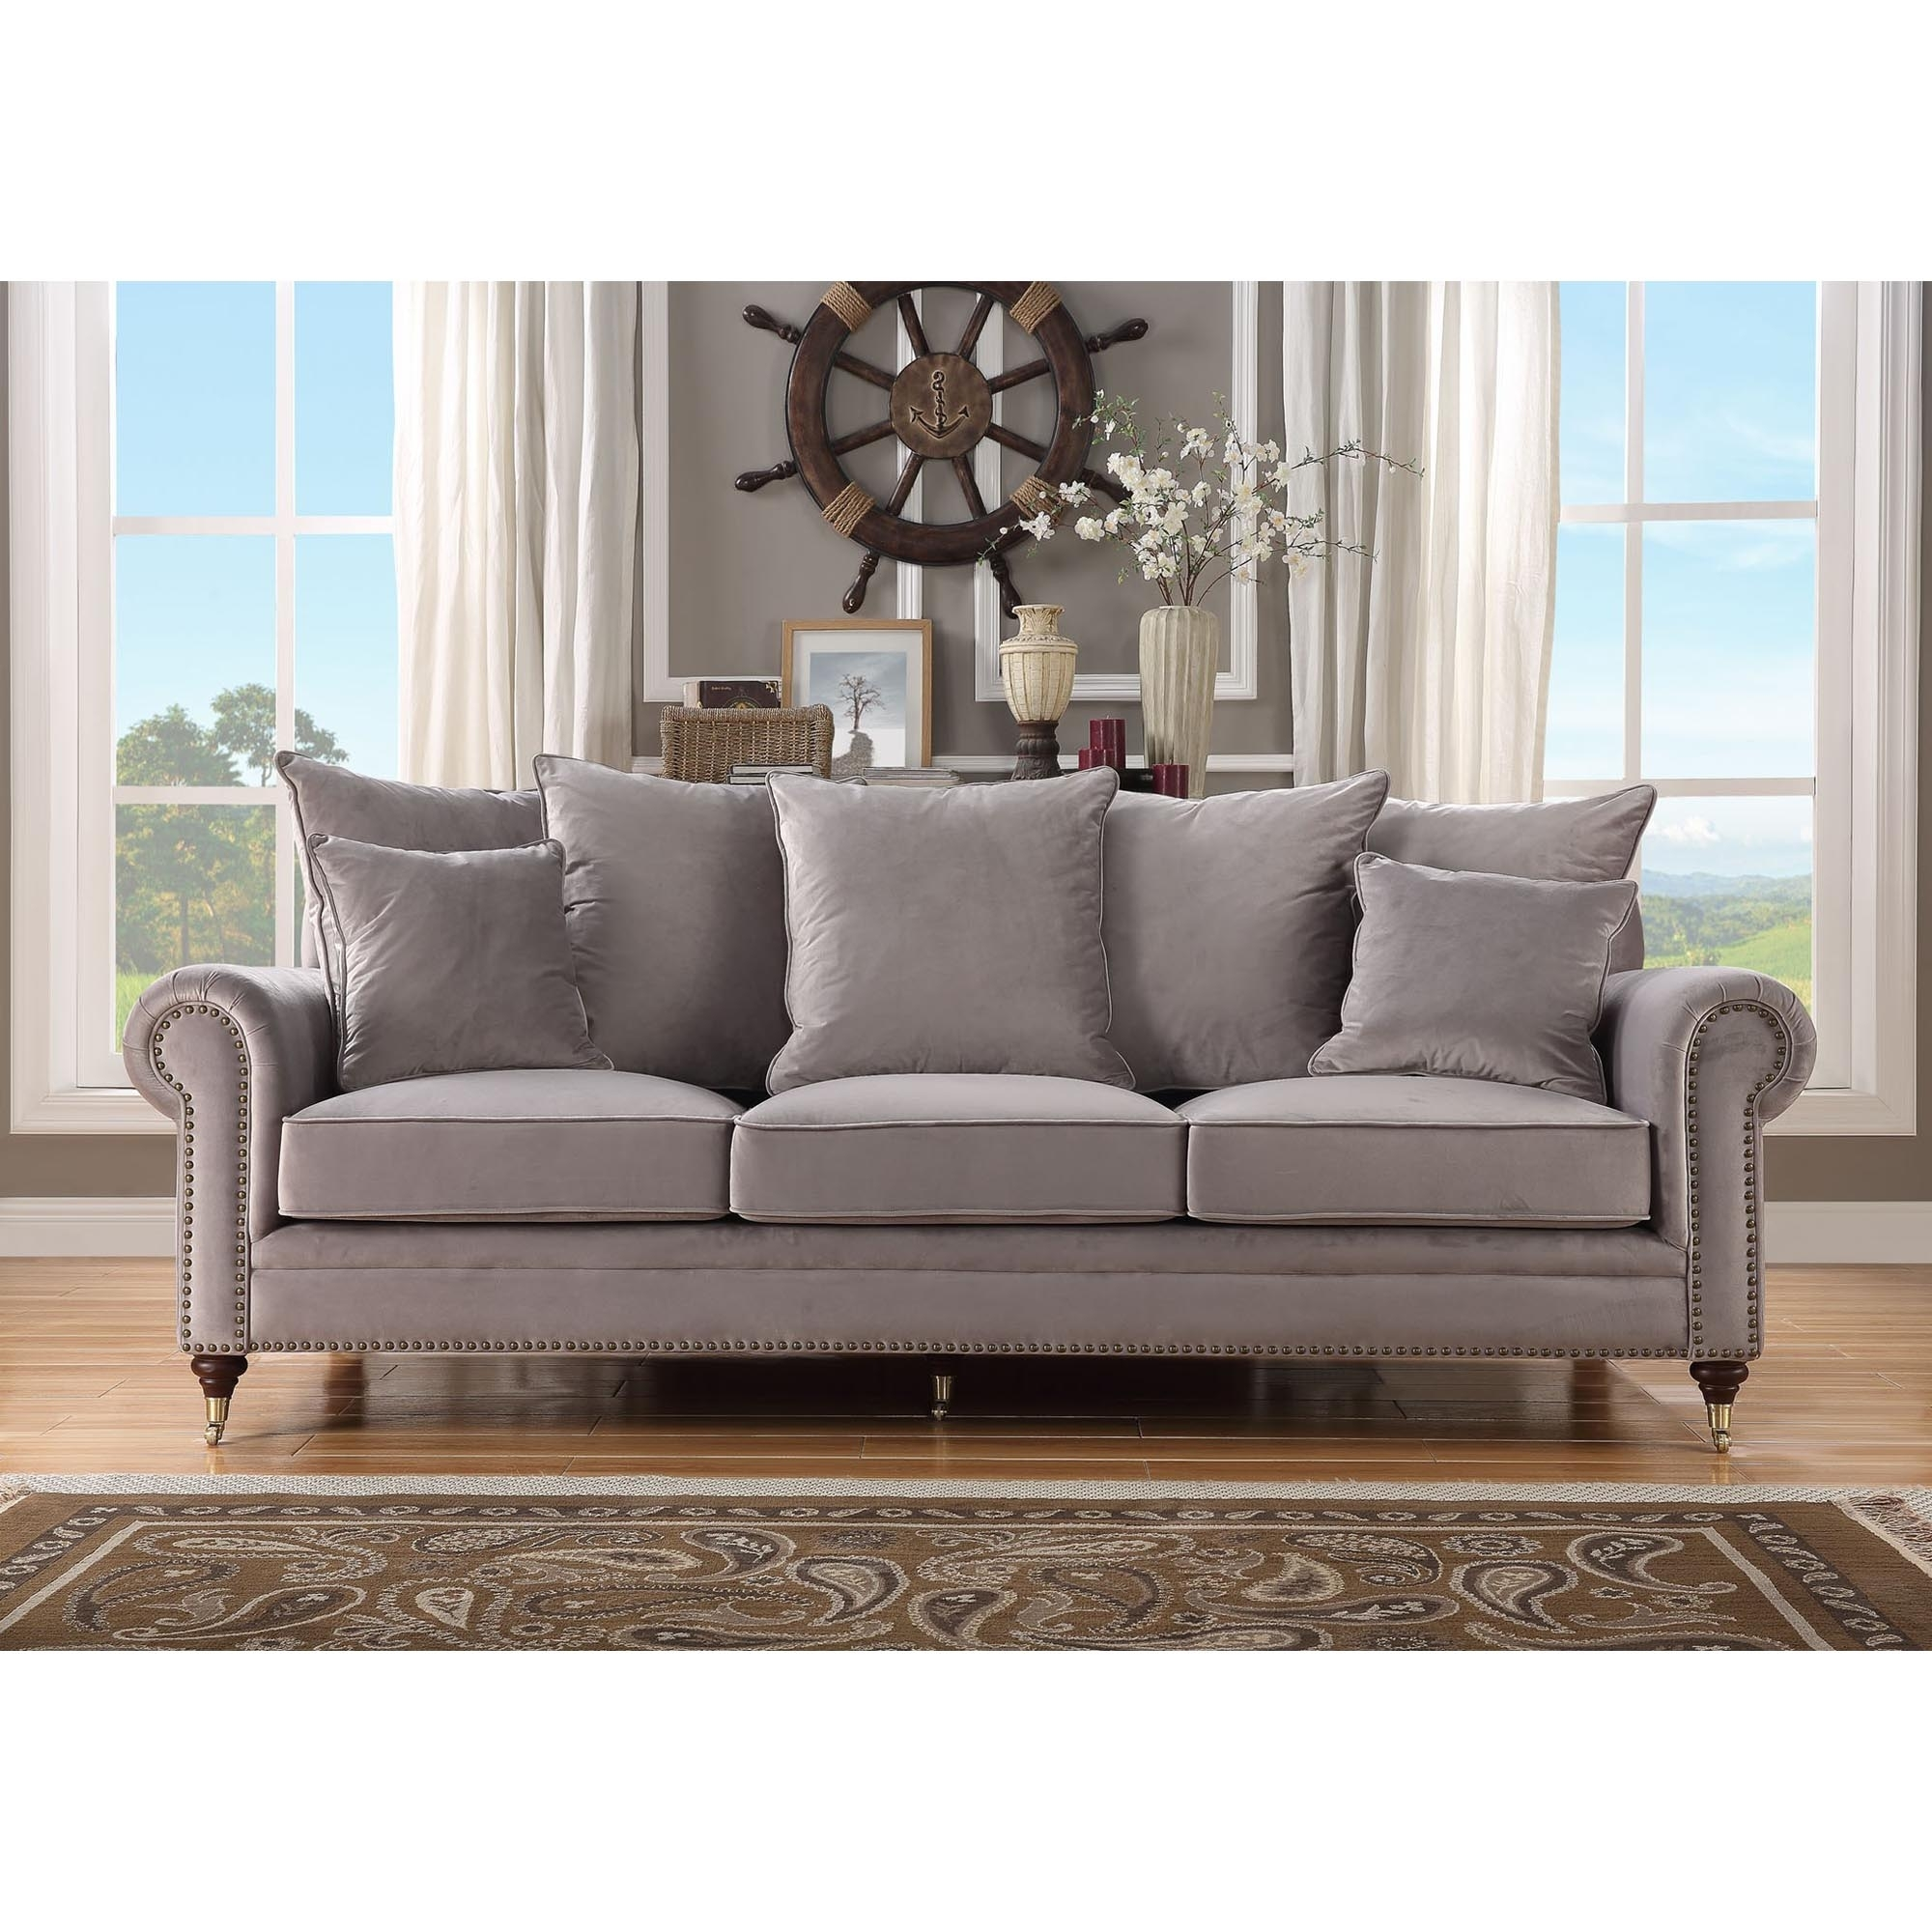 Beautiful Hampton 3 Seater Grey Sofa